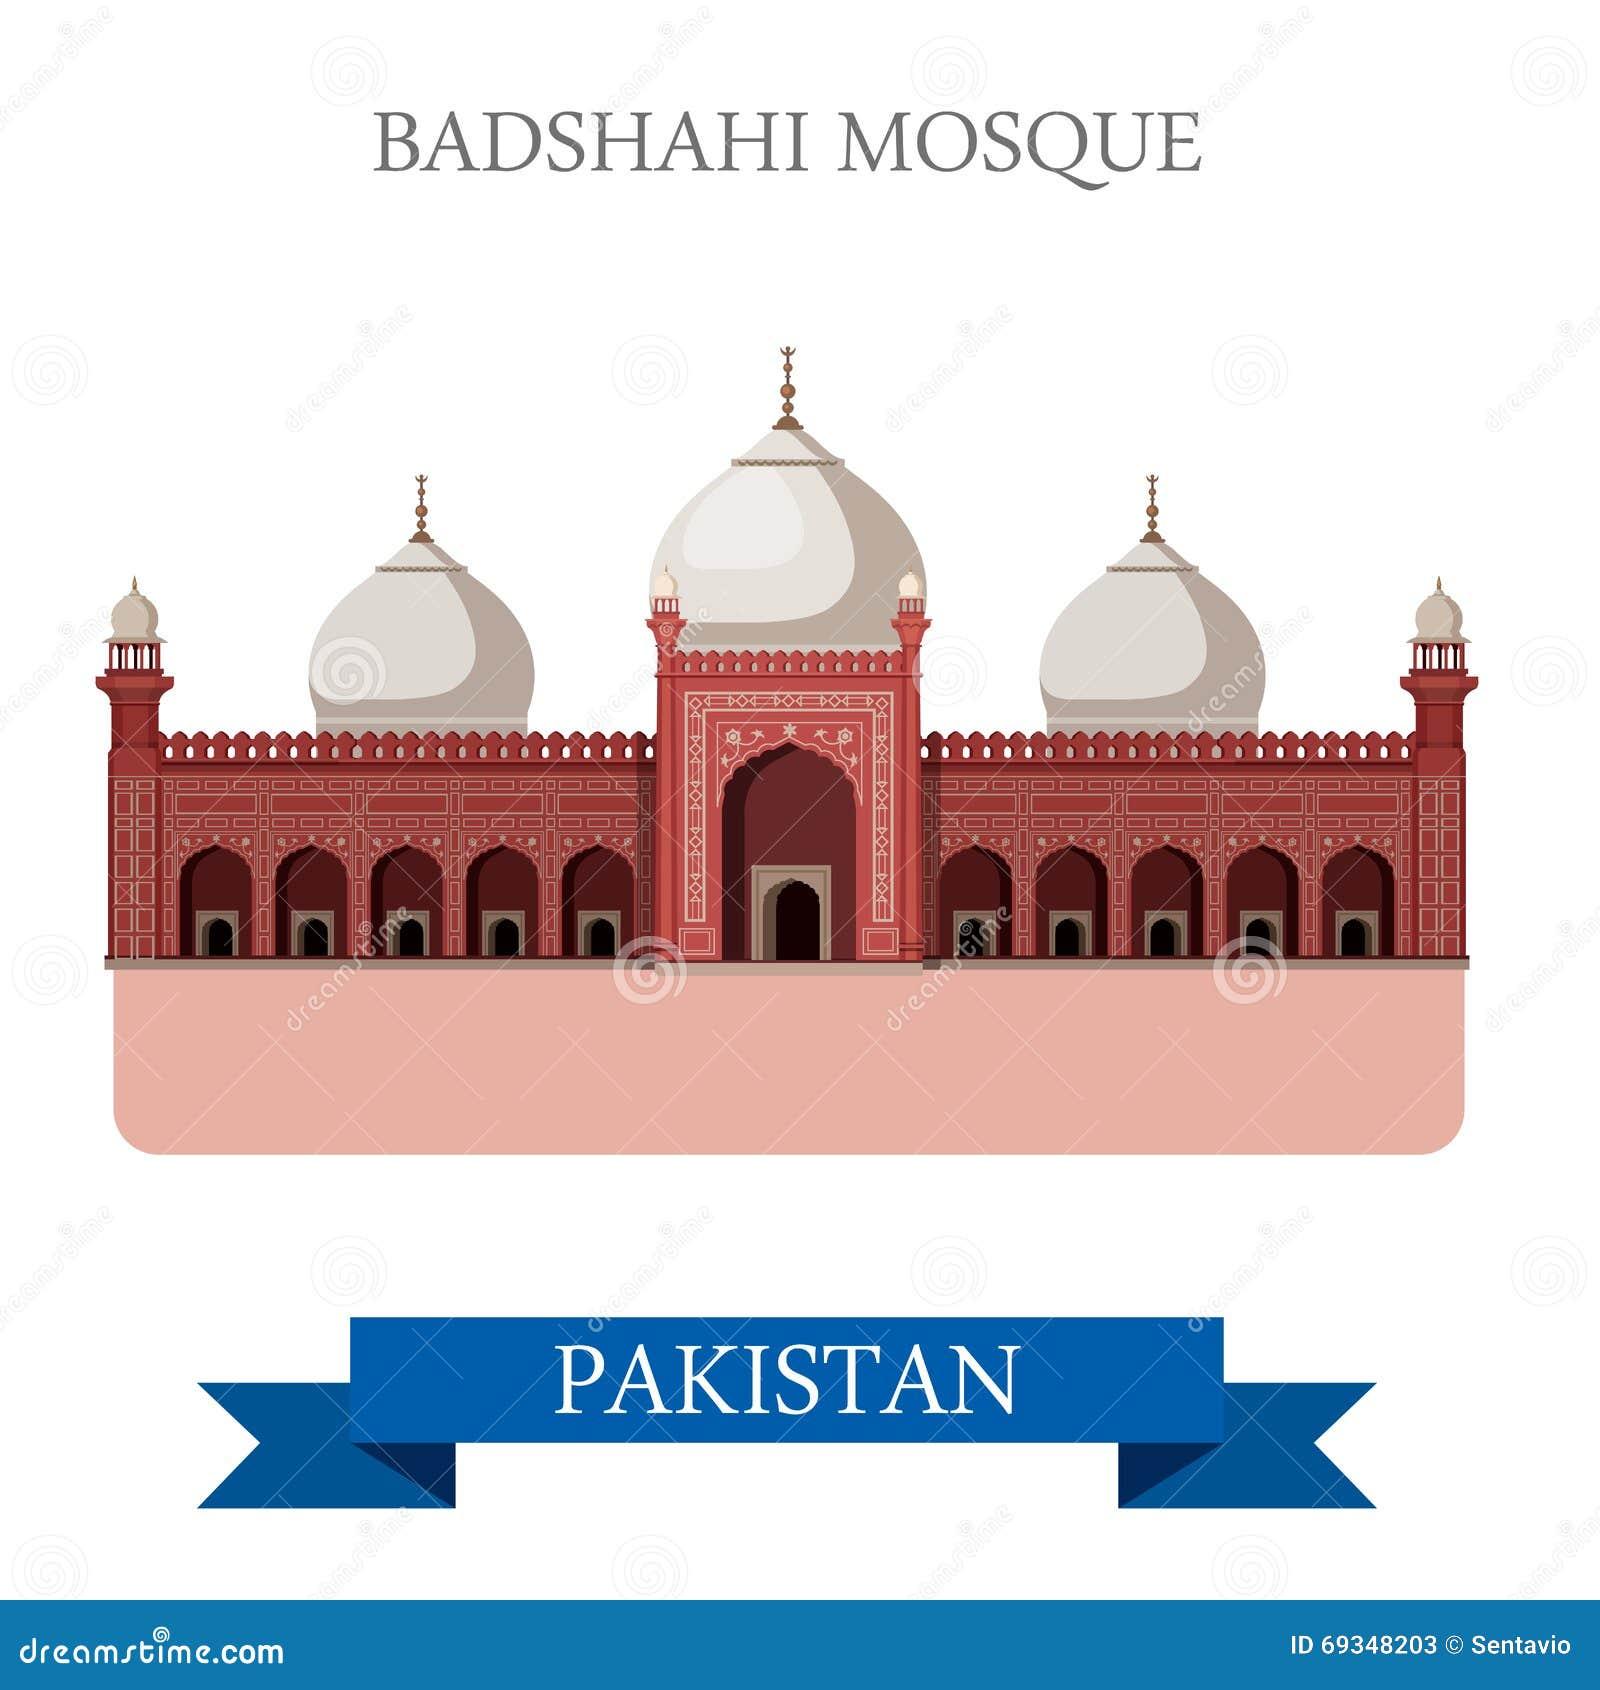 Badshahi Mosque Lahore Pakistan Vector Flat Attraction